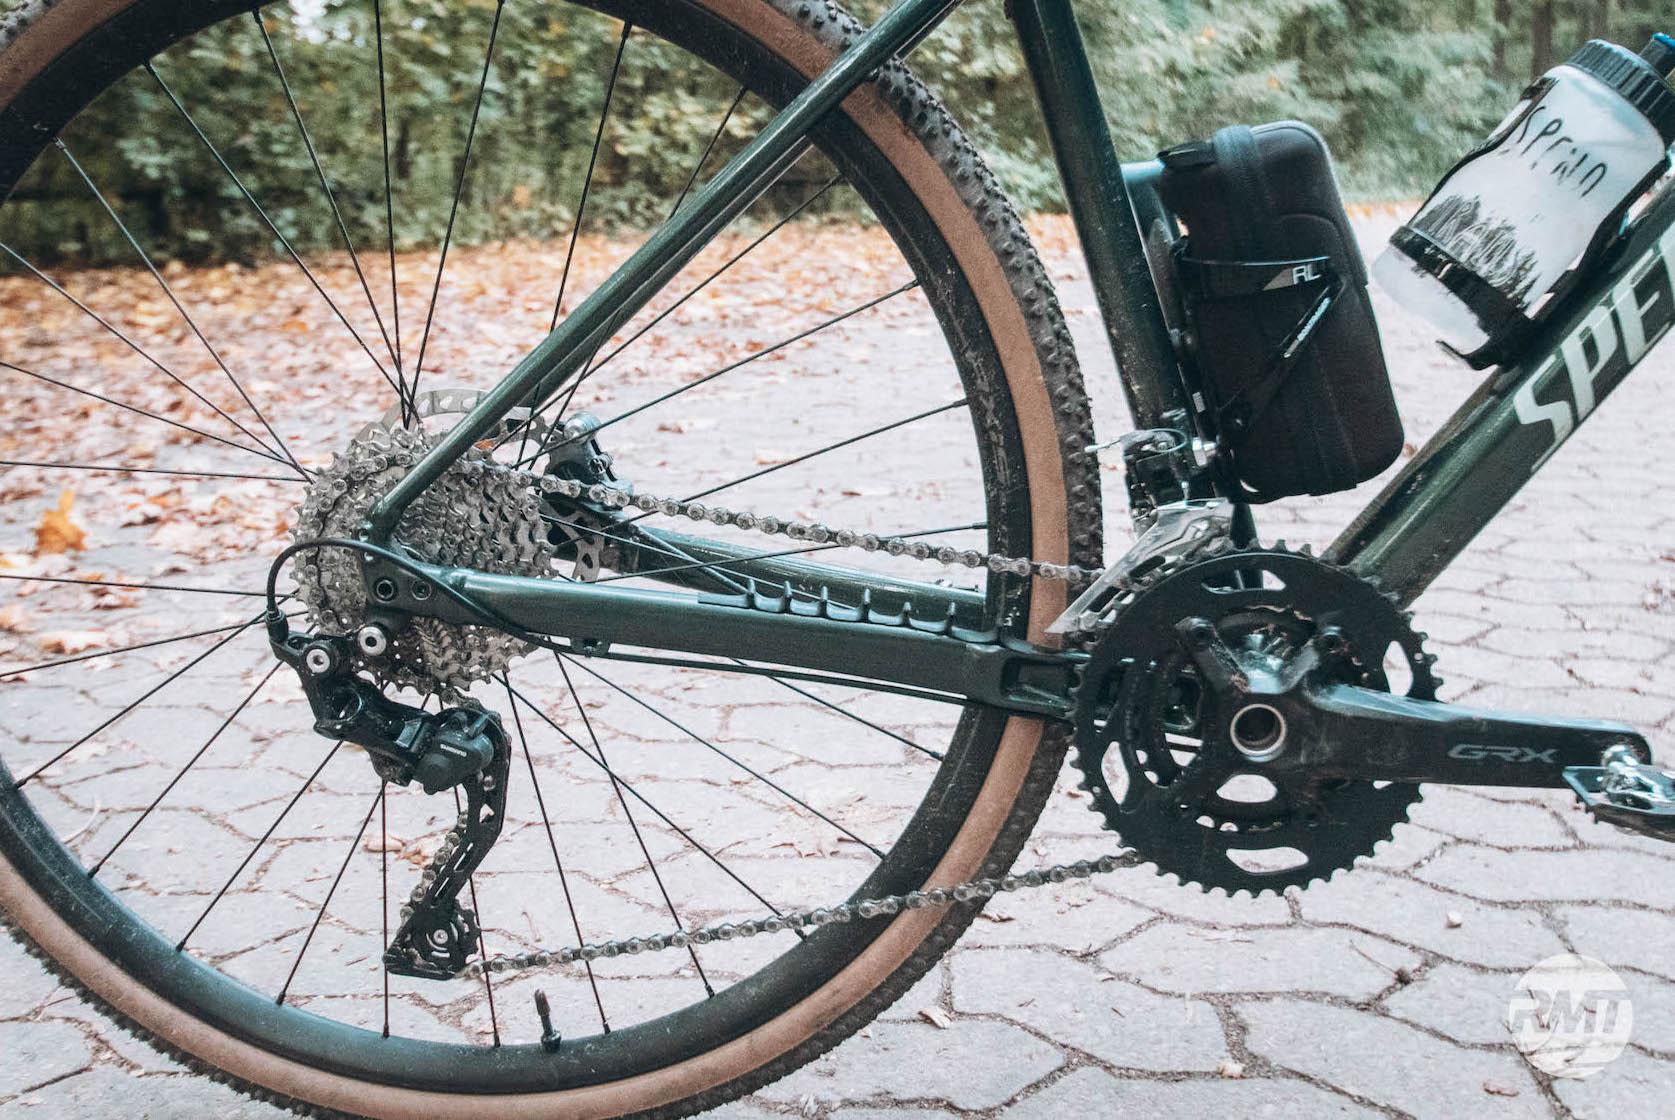 Gravel Fahrtechnik Basic Hannover |Bad Salzdetfurth - CycloCross Training - Rock my Trail Bikeschule